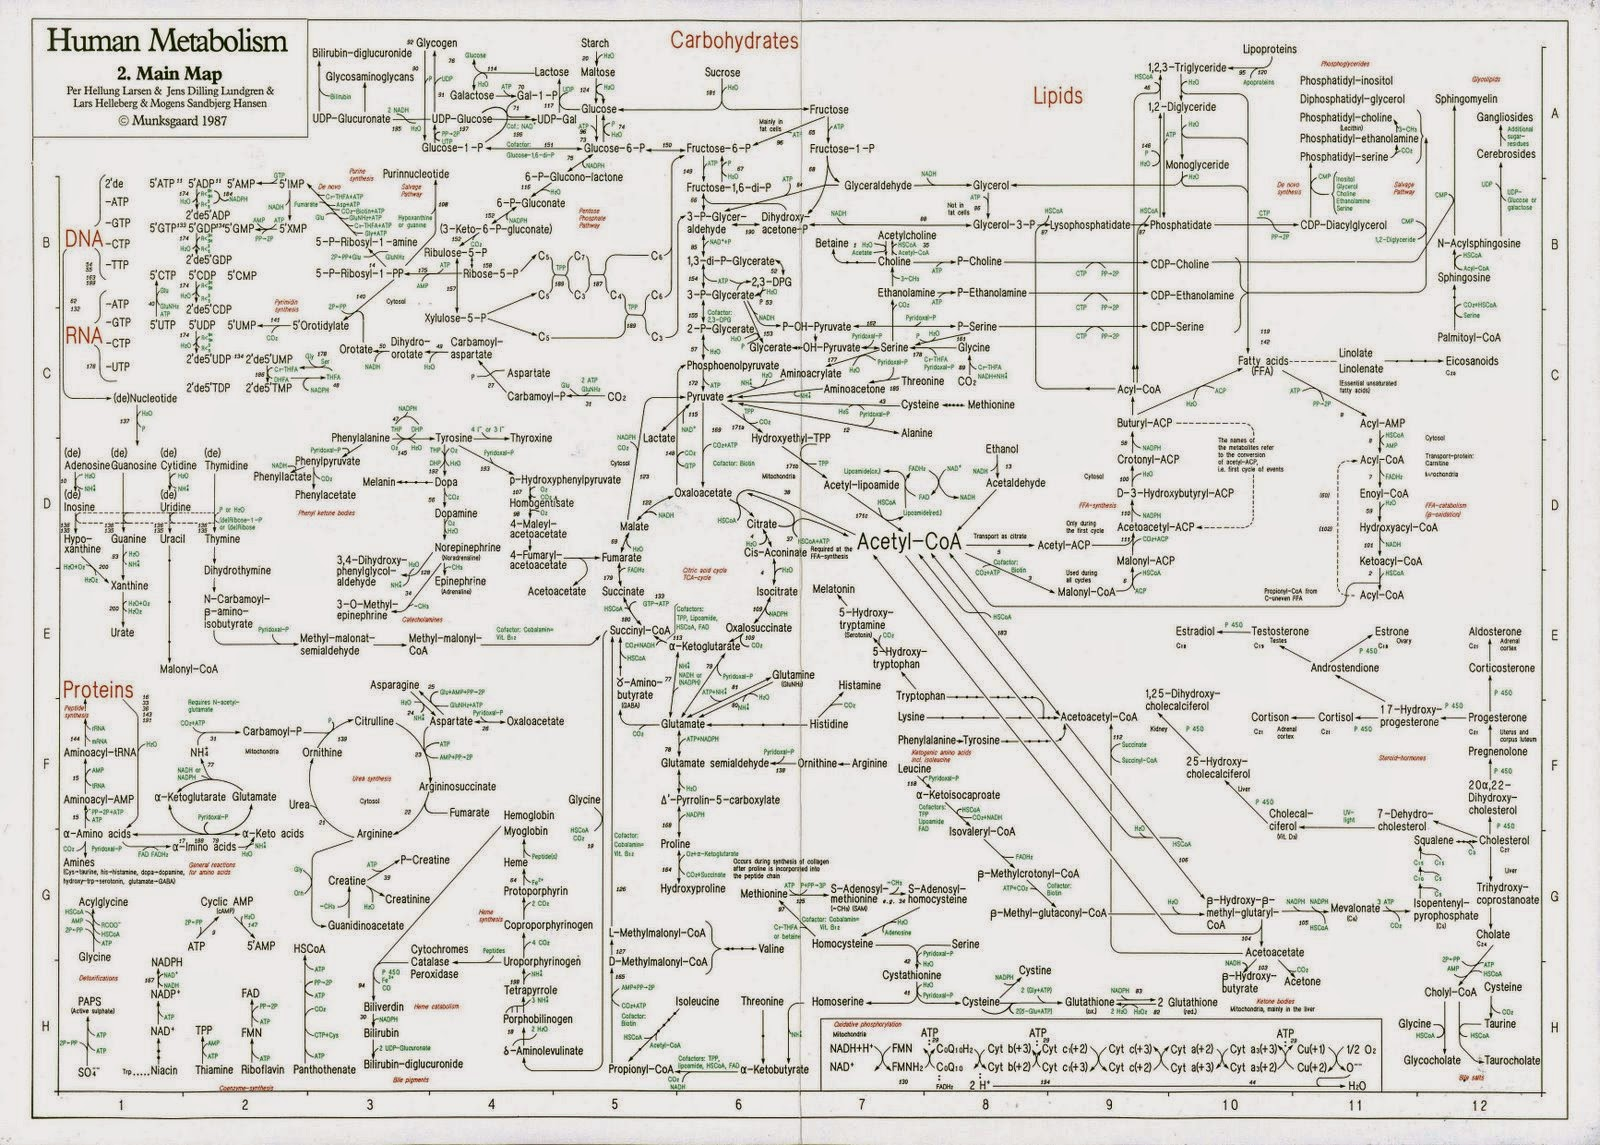 O arquiteto da vida: O complexo mapa metabólico humano